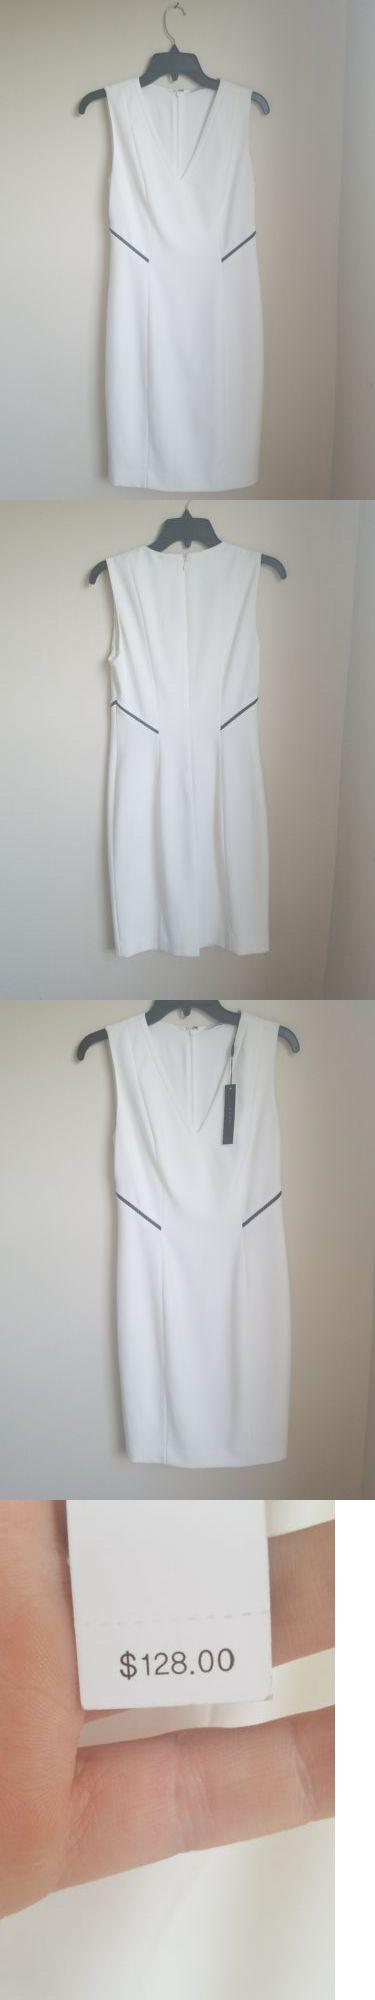 Women Fashion: $128 White Sleeveless Women S Elie Tahari Dress Nwt Size 2 New -> BUY IT NOW ONLY: $61 on eBay!